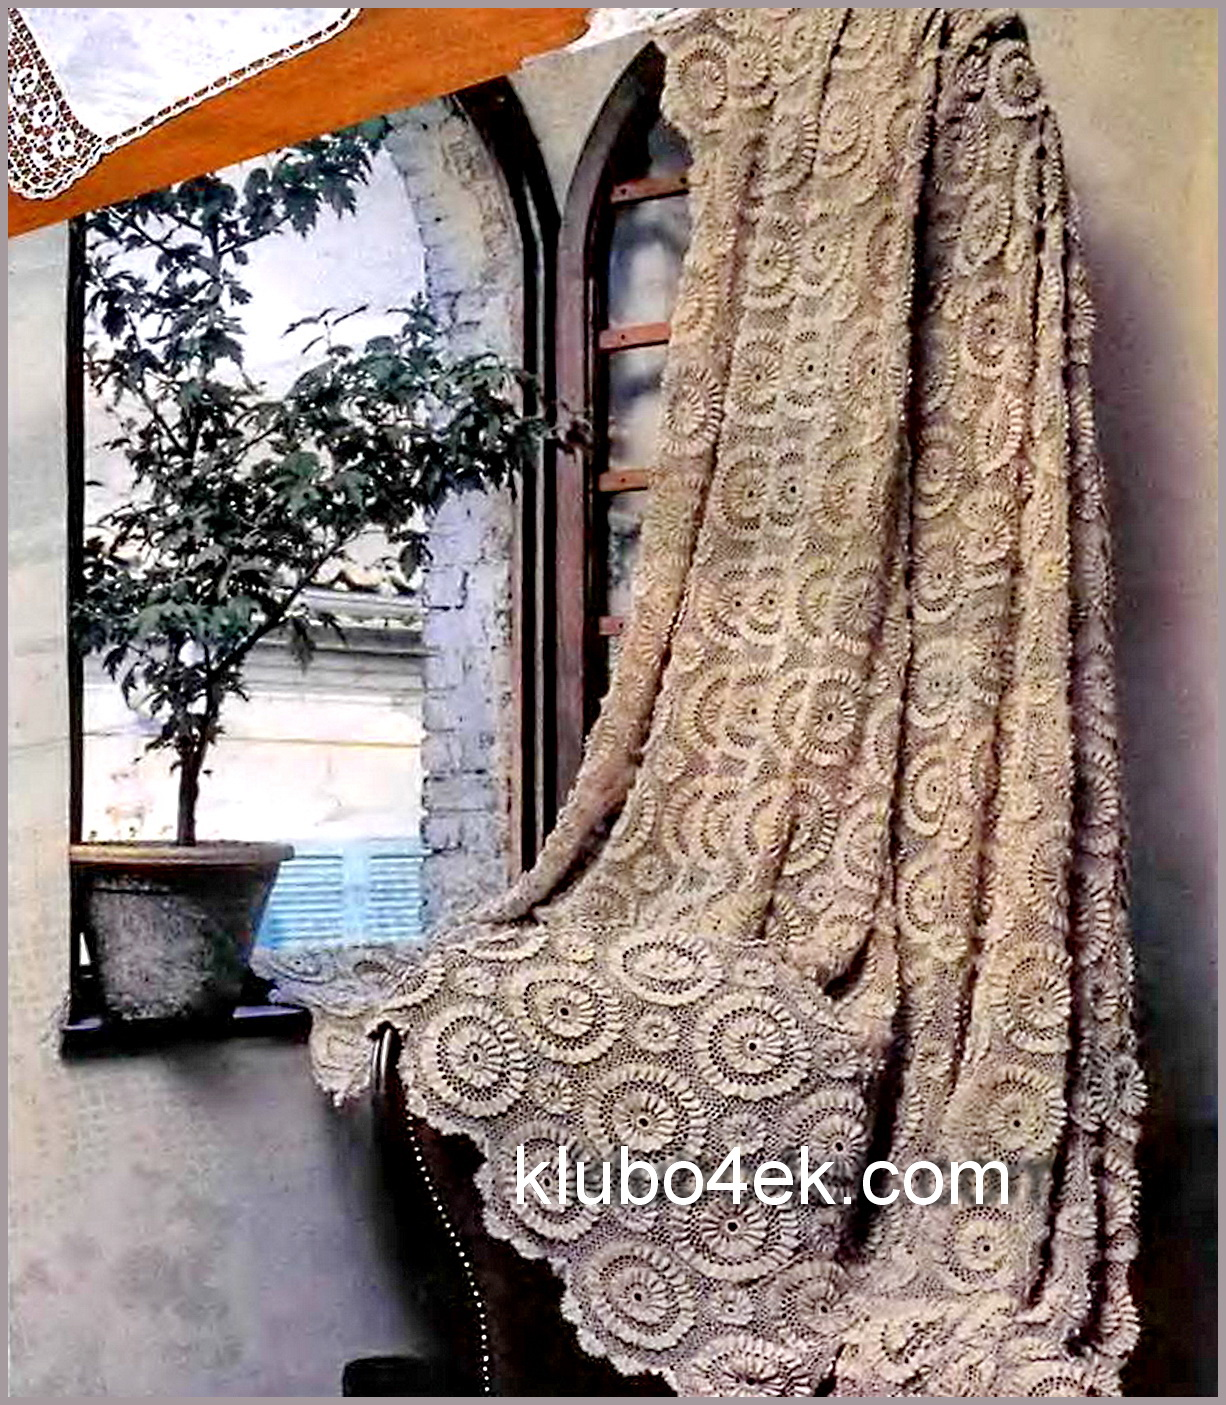 Free crochet patterns to download crochet patterns for free crochet bedspread 1672 bankloansurffo Images